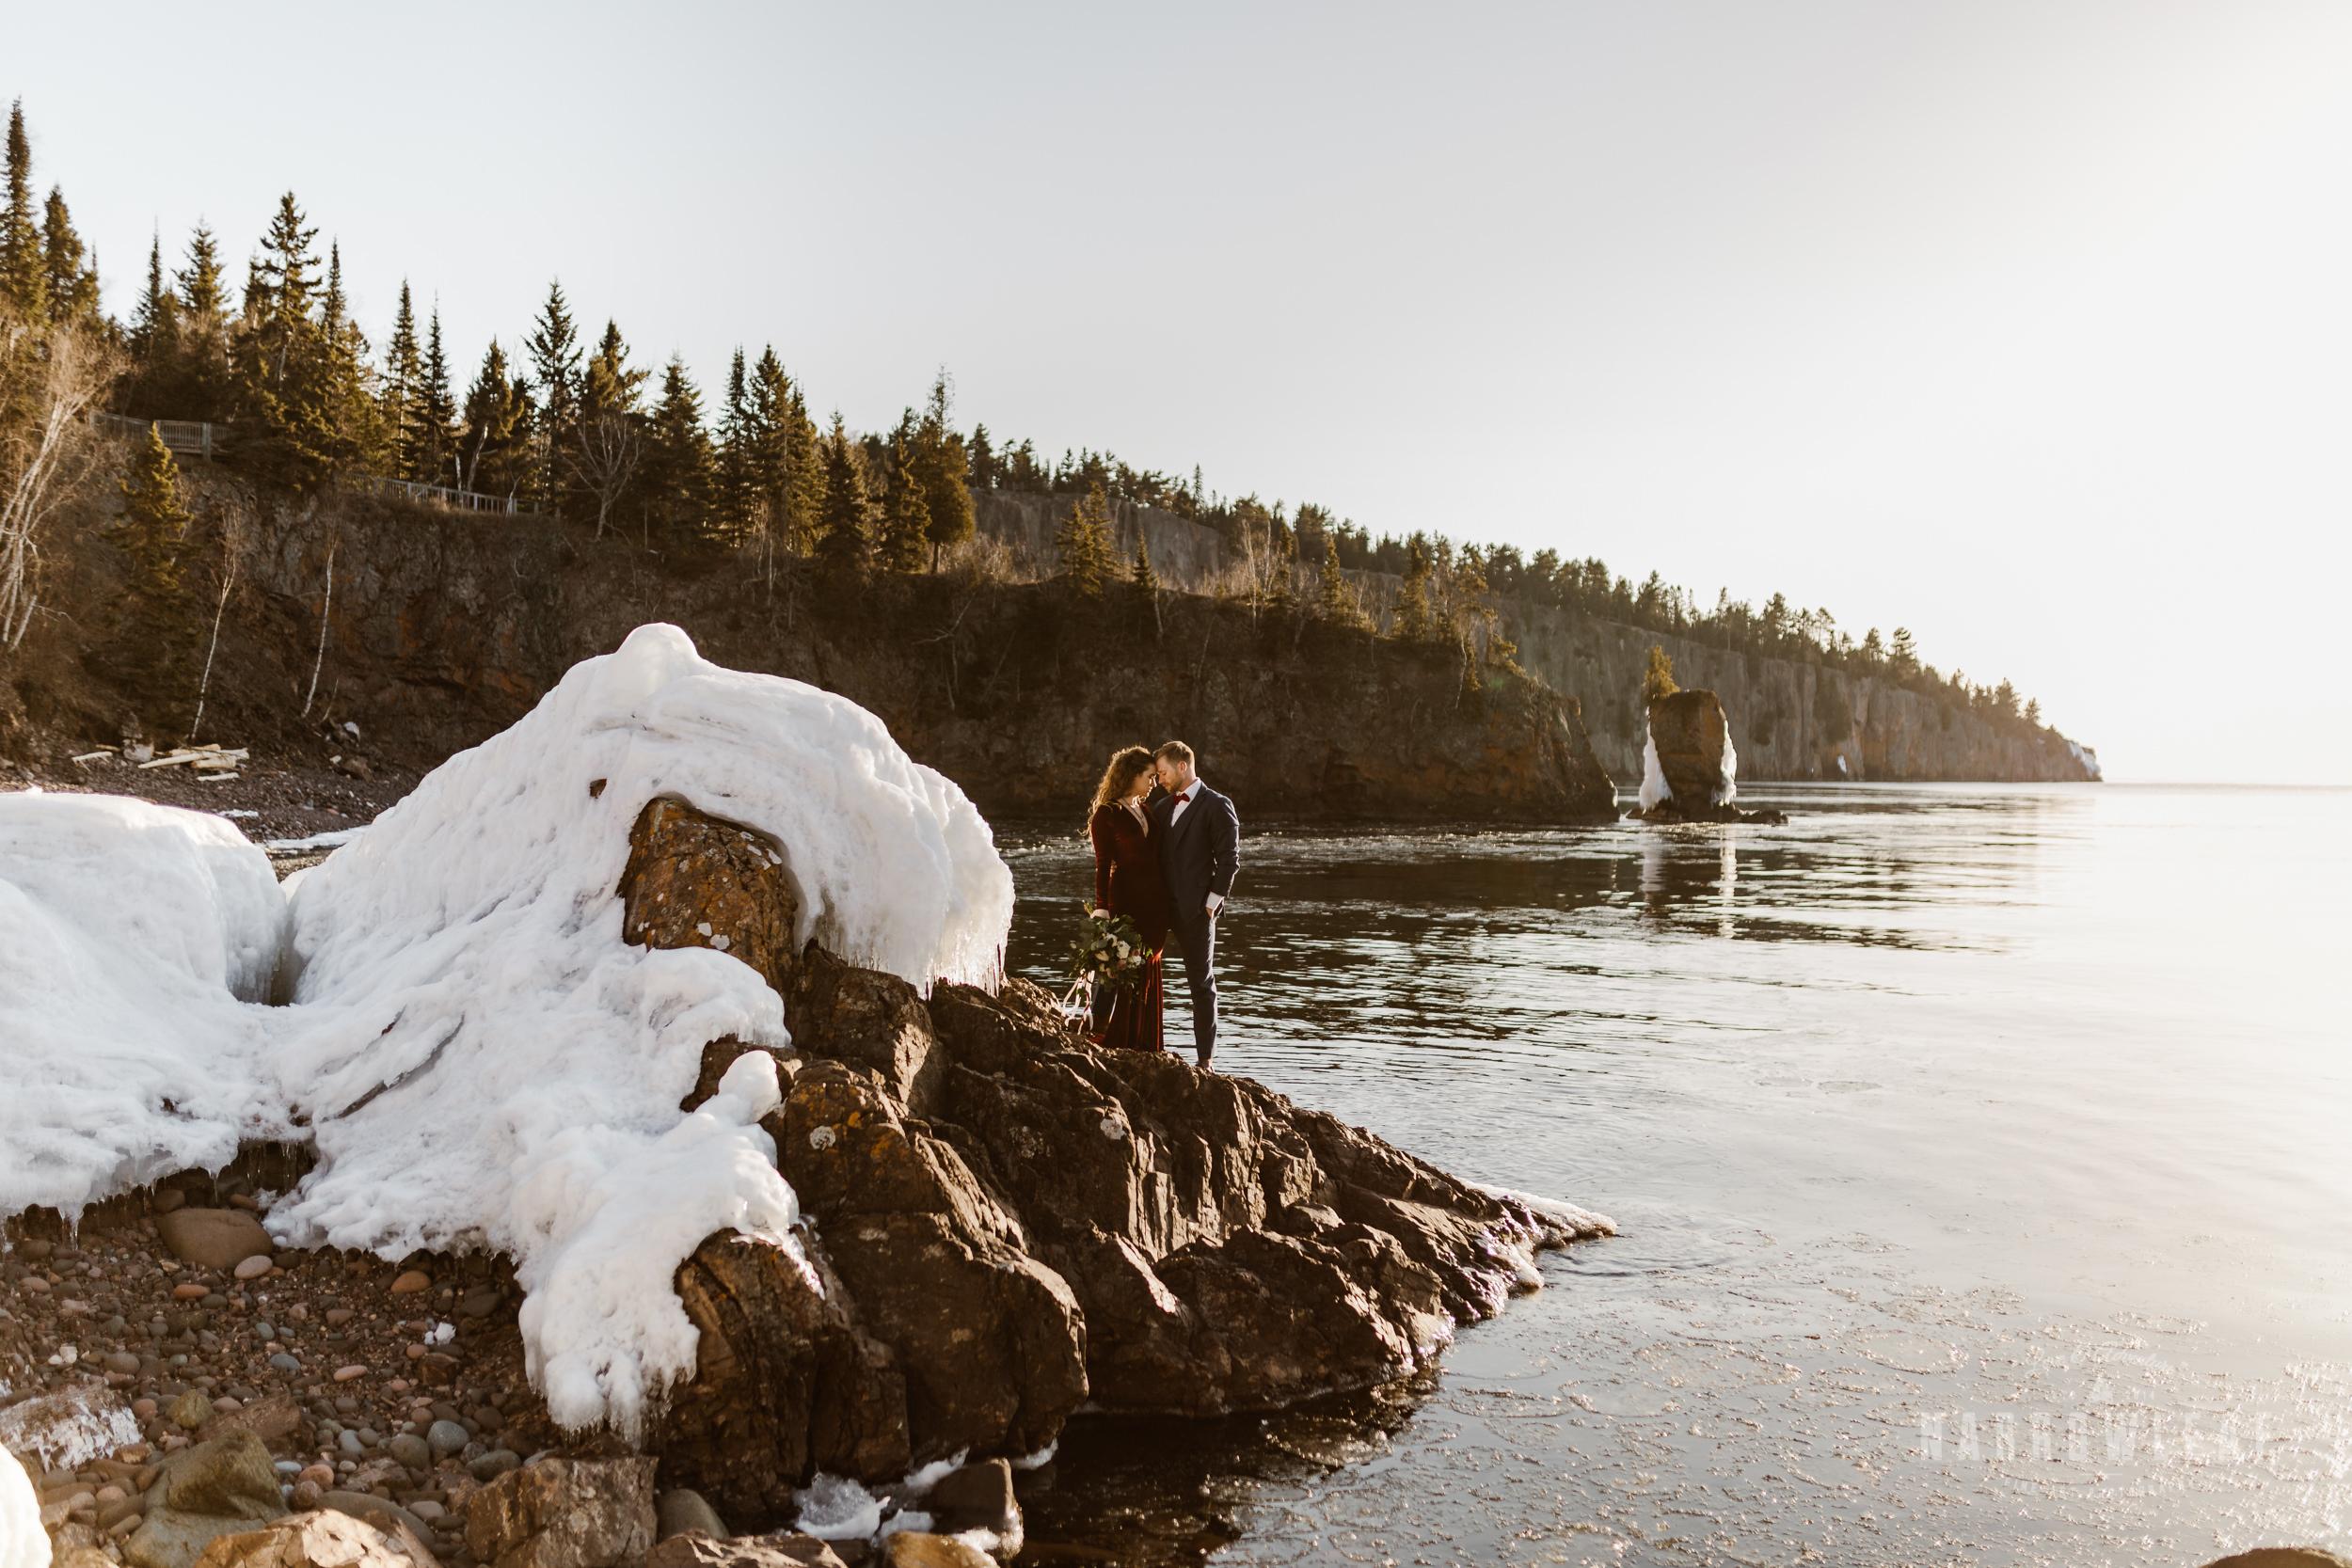 winter-adventure-elopement-tettegouche-state-park-minnesota-Narrowleaf_Love_and_Adventure_Photography-8569.jpg